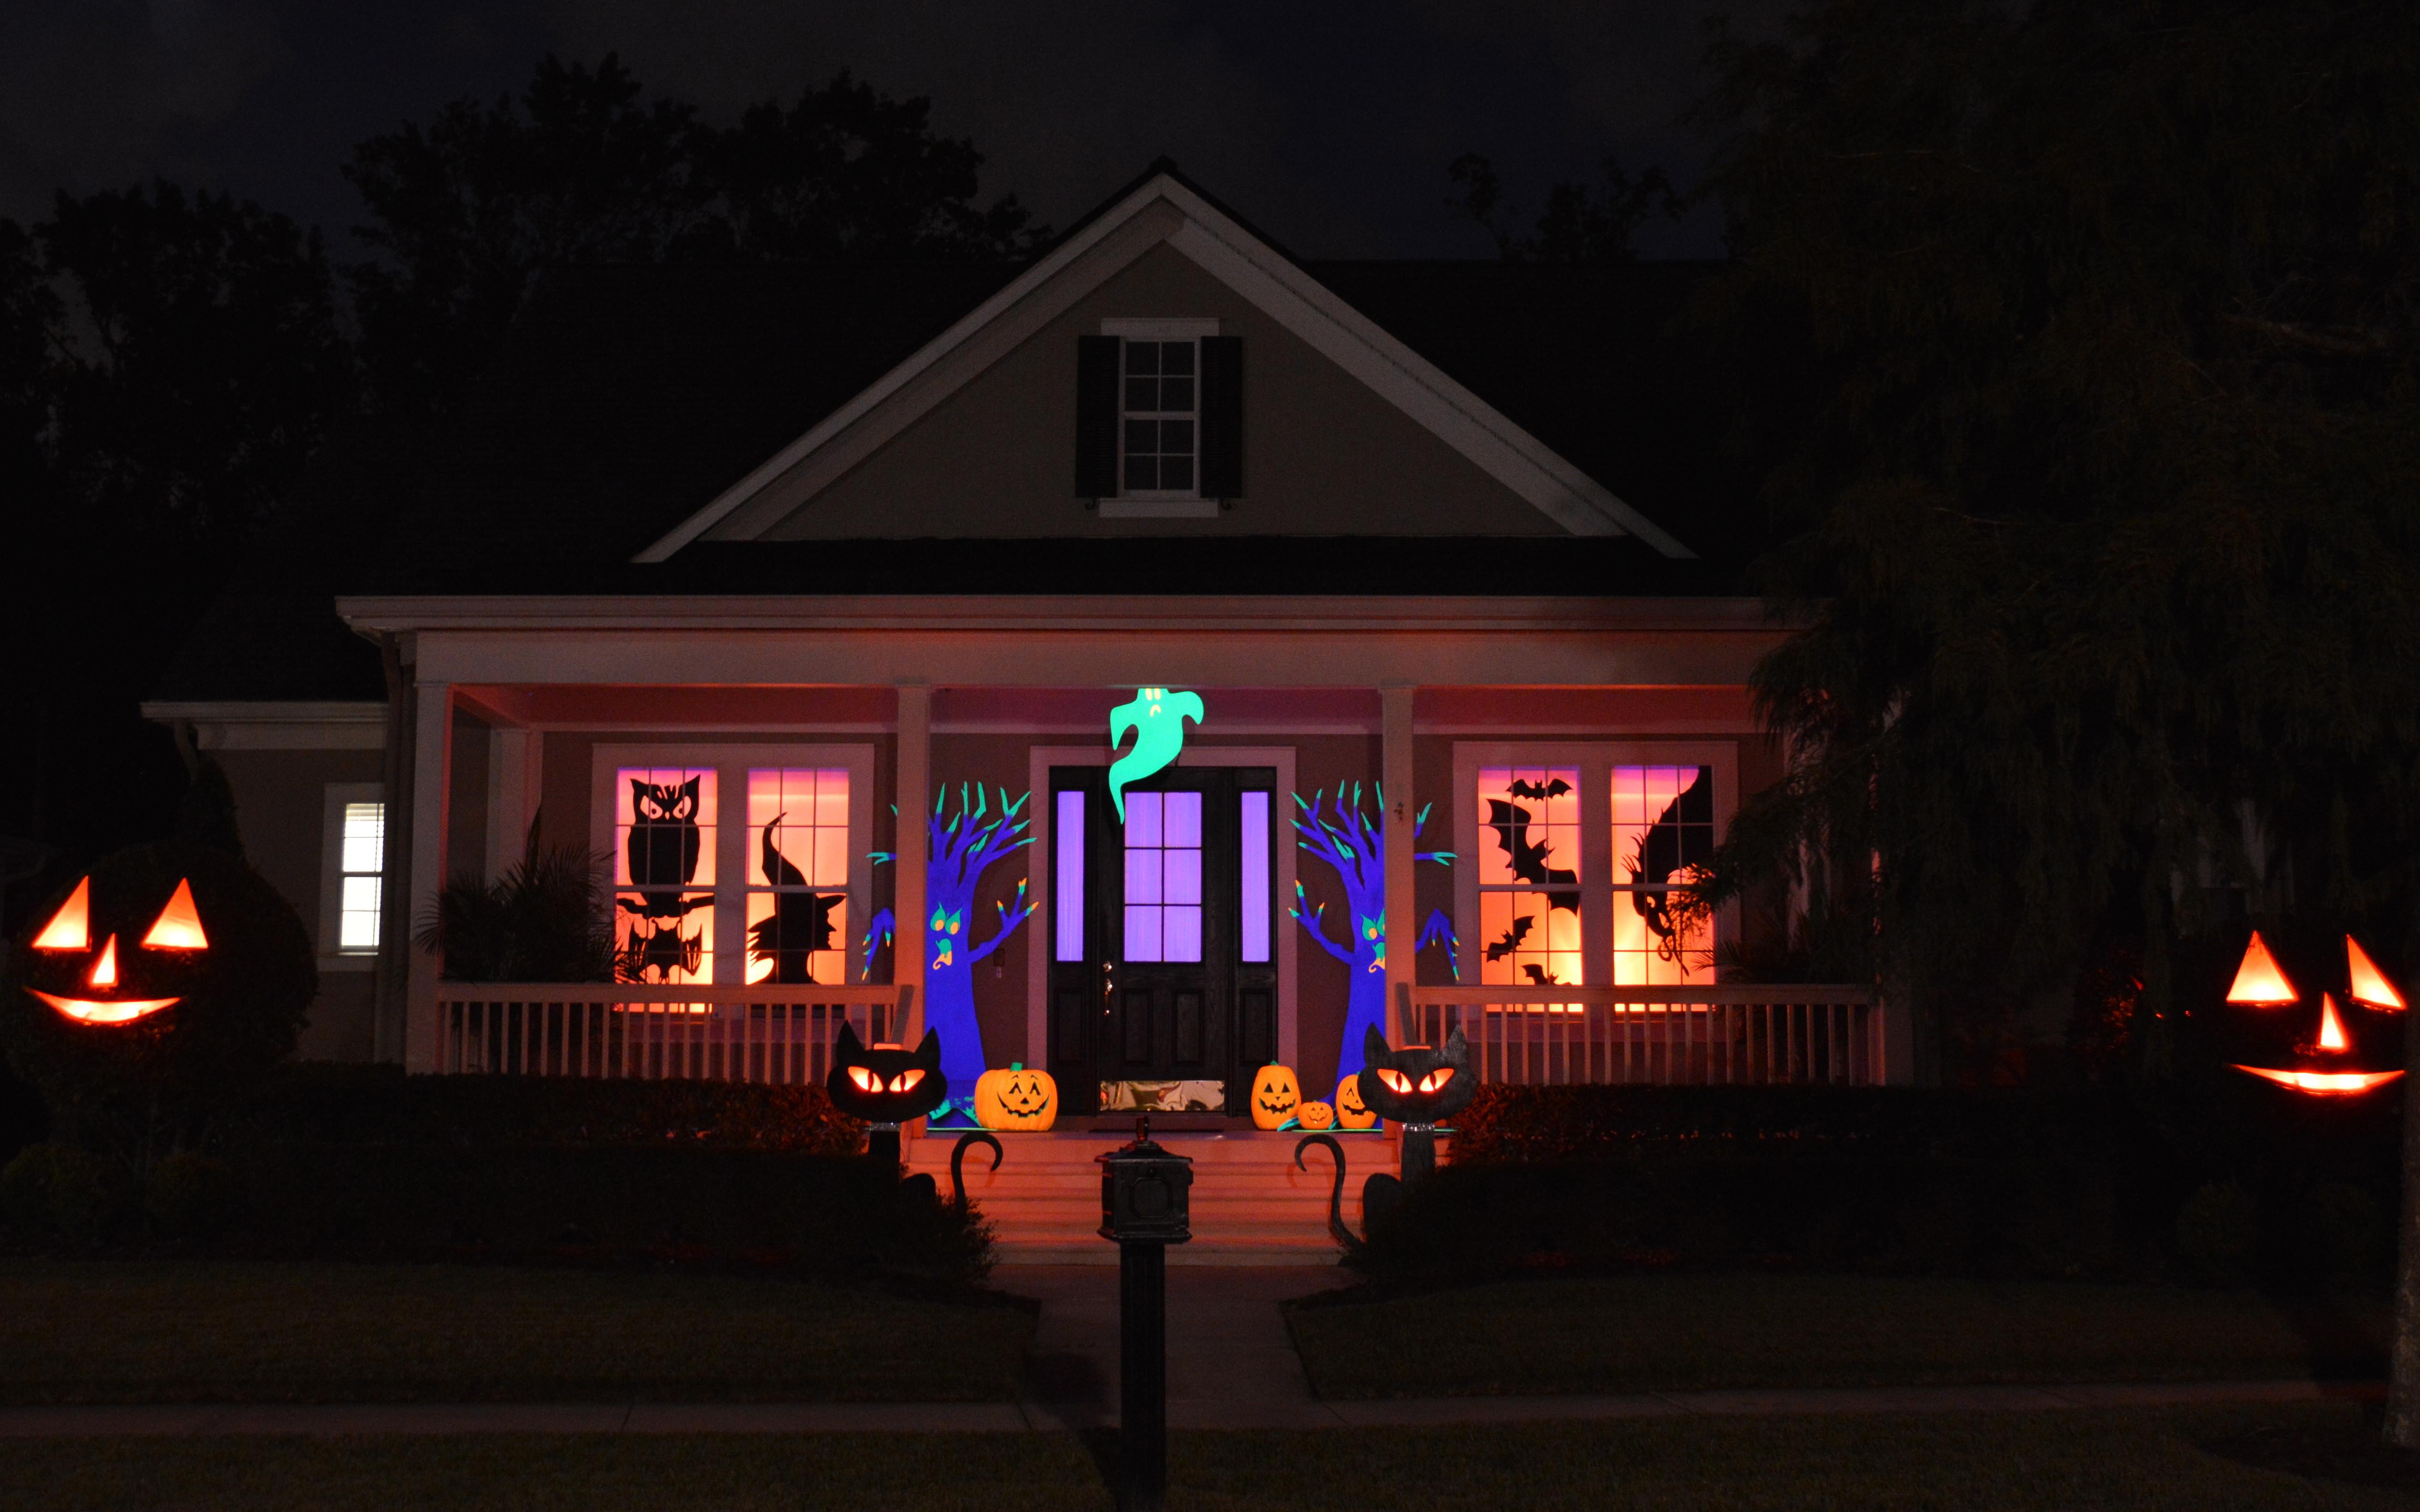 Halloween Decor Outdoor  Chloe s Inspiration Halloween Outdoor Decorations in